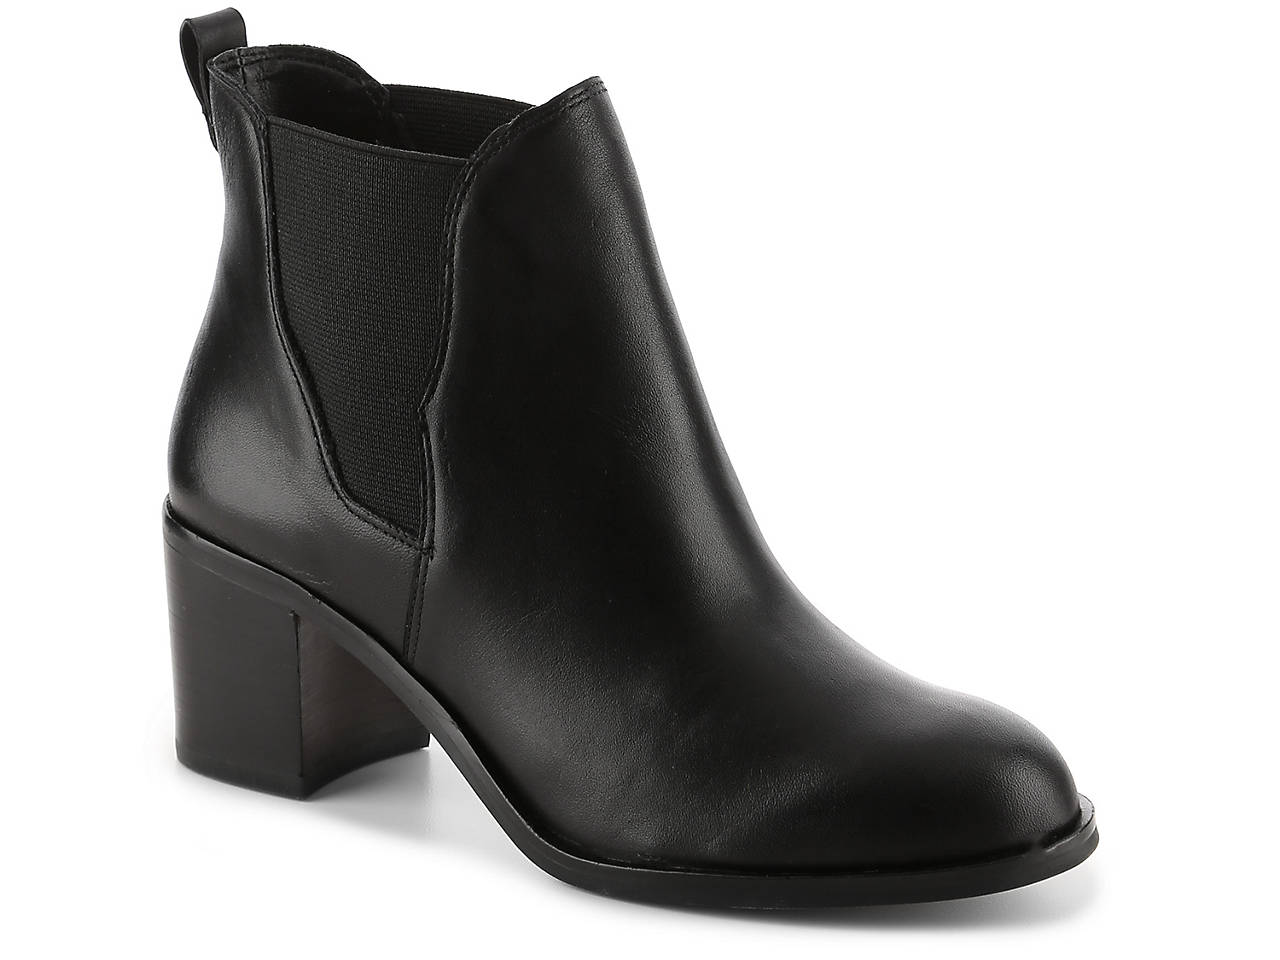 0399dfc3f6f3 Sam Edelman Justin Chelsea Boot Women s Shoes